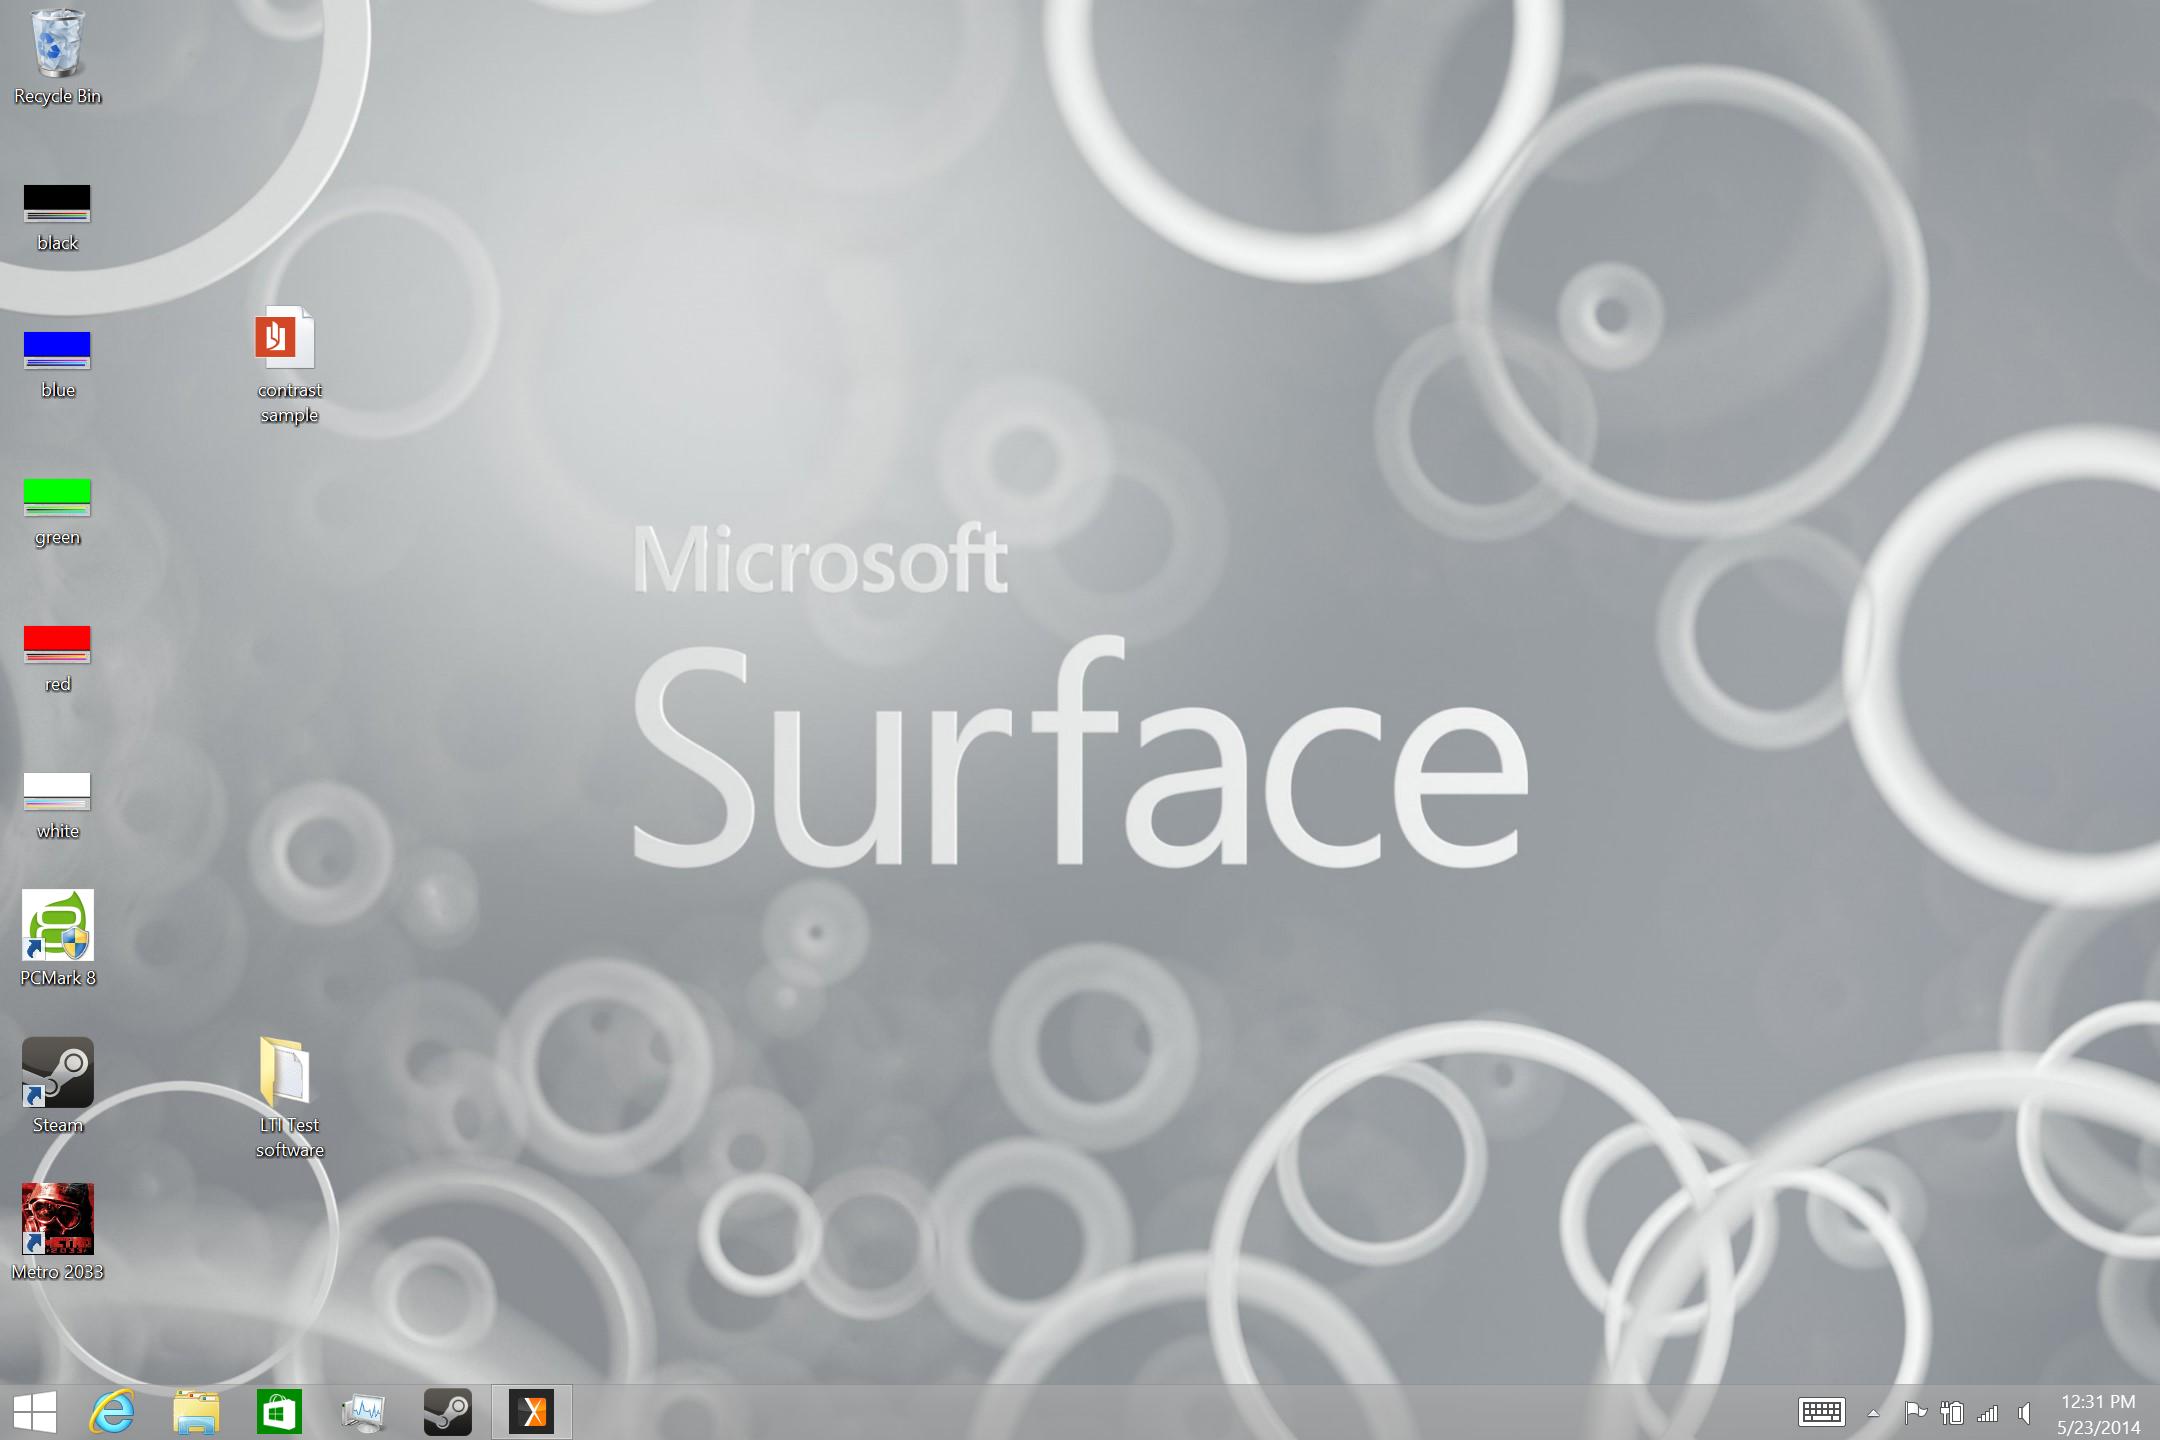 A screenshot of the Microsoft Surface 3's legacy desktop.